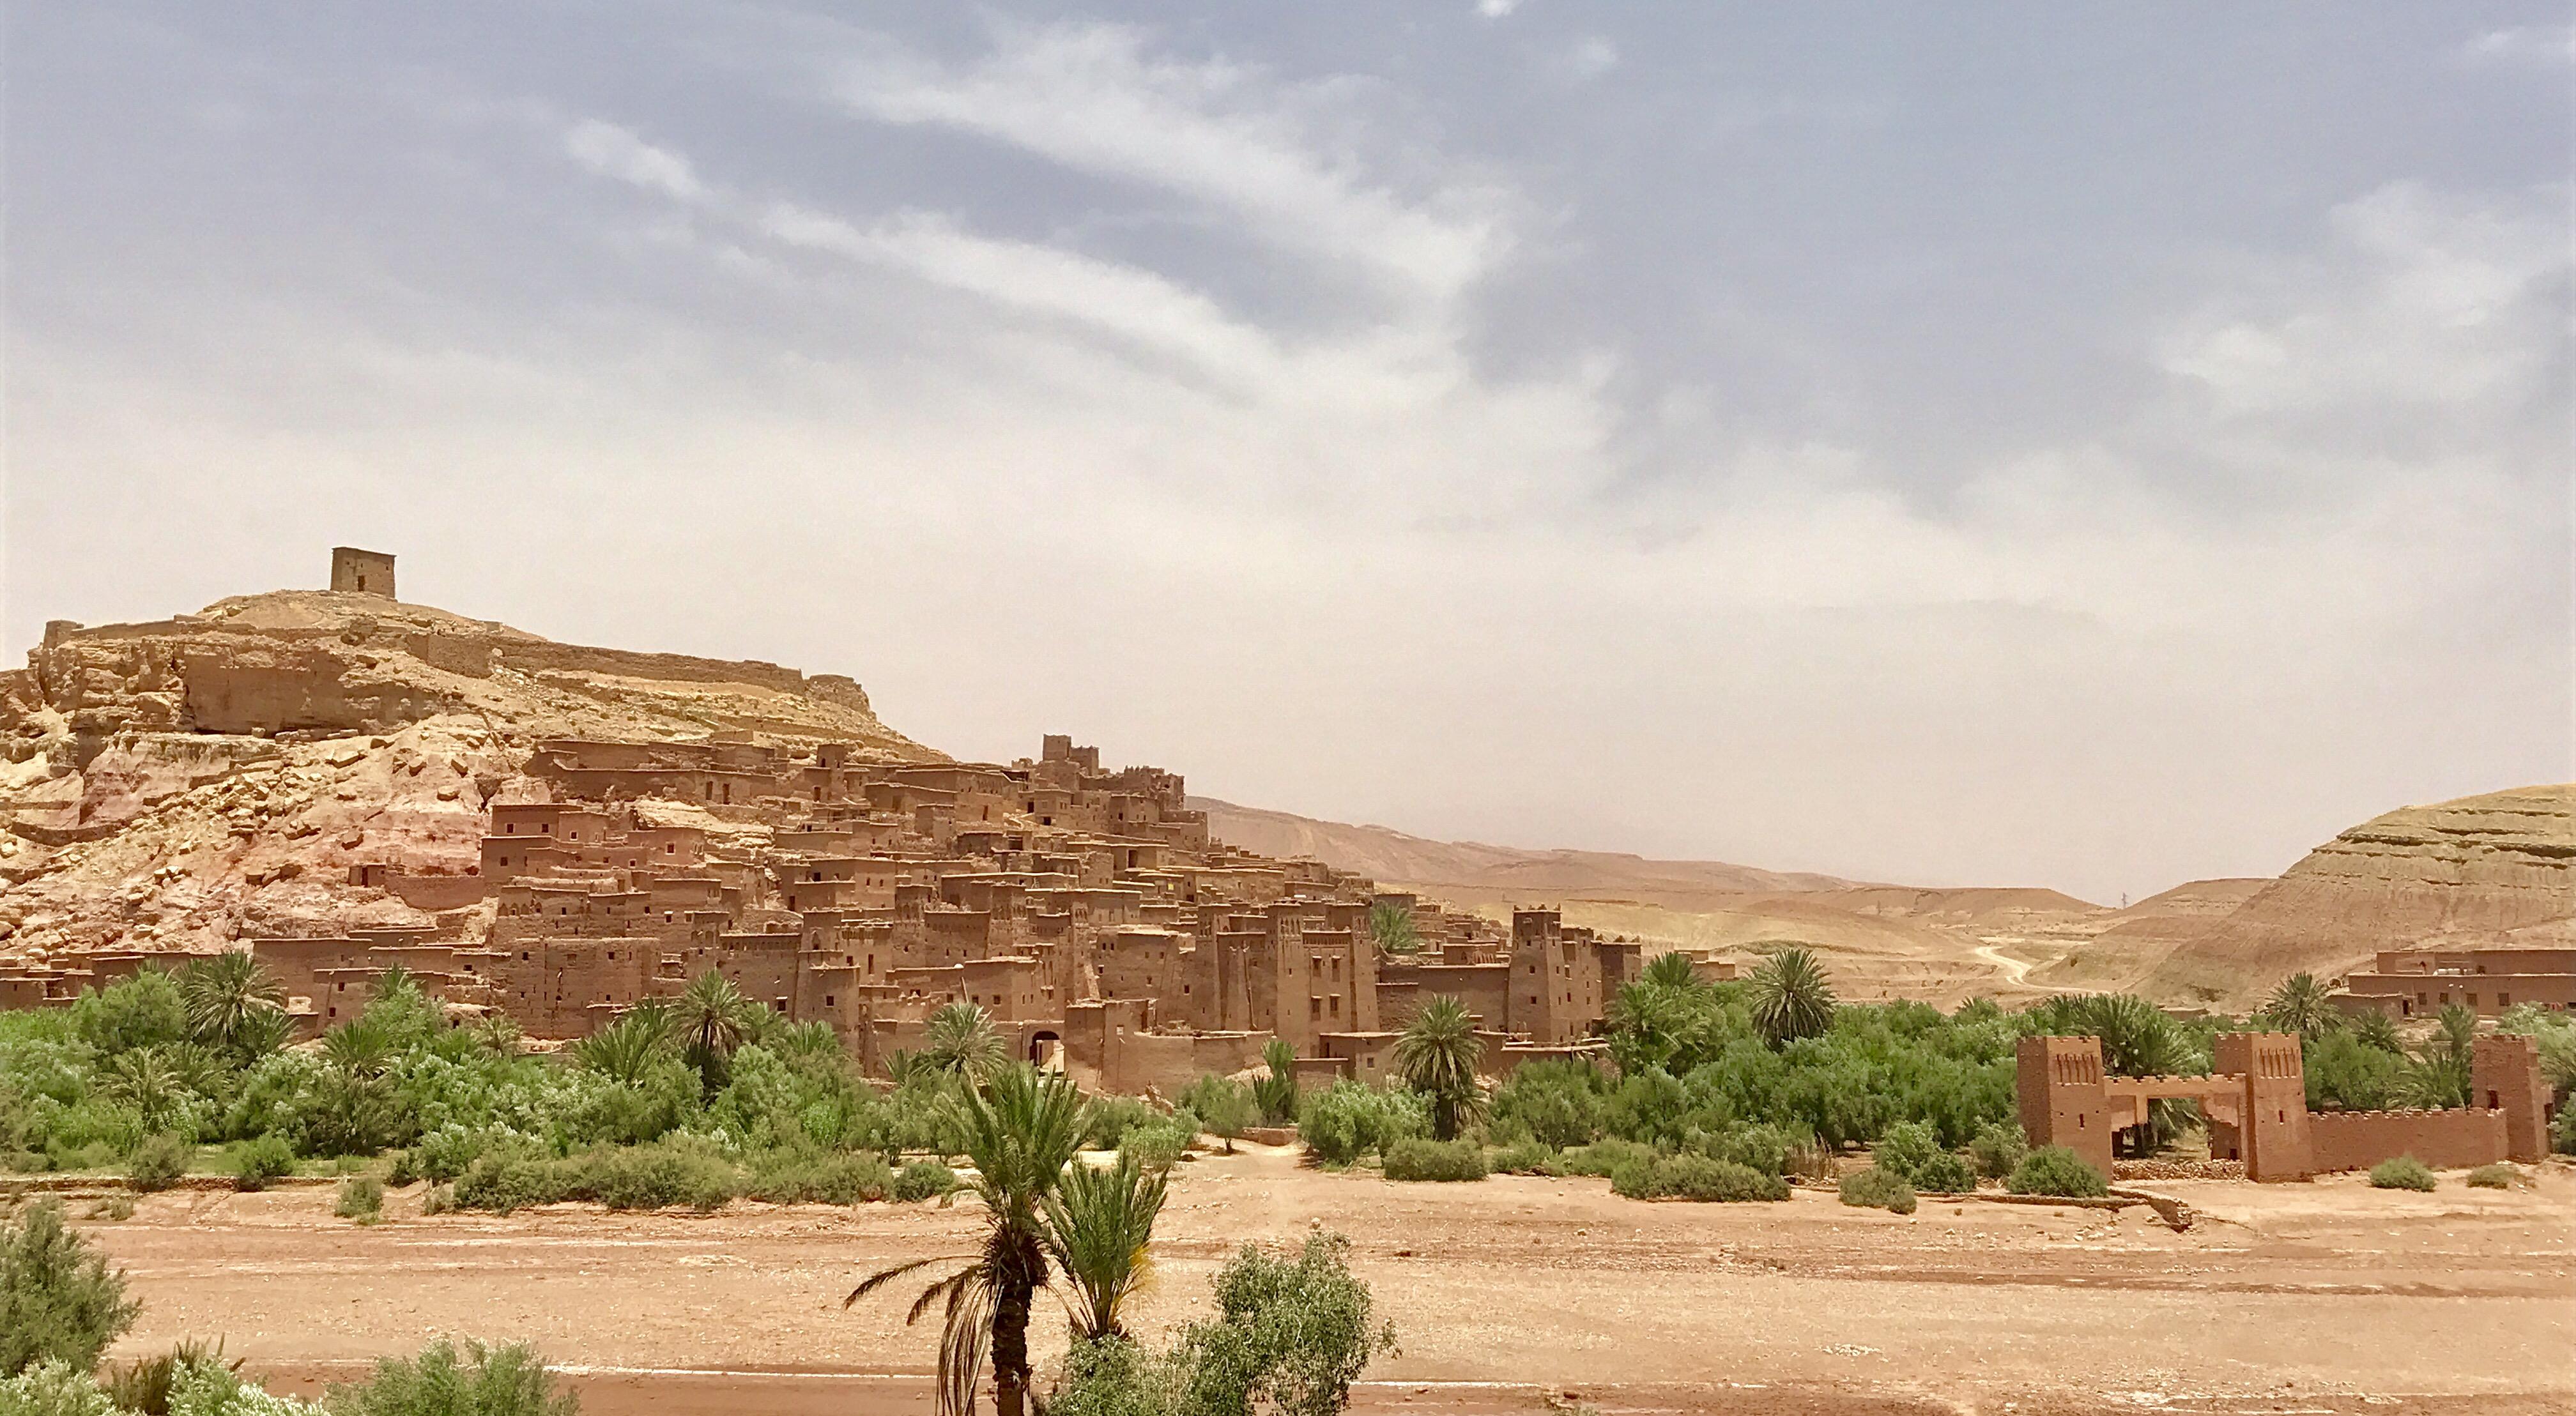 berber-city-morocco-lustforthesublime